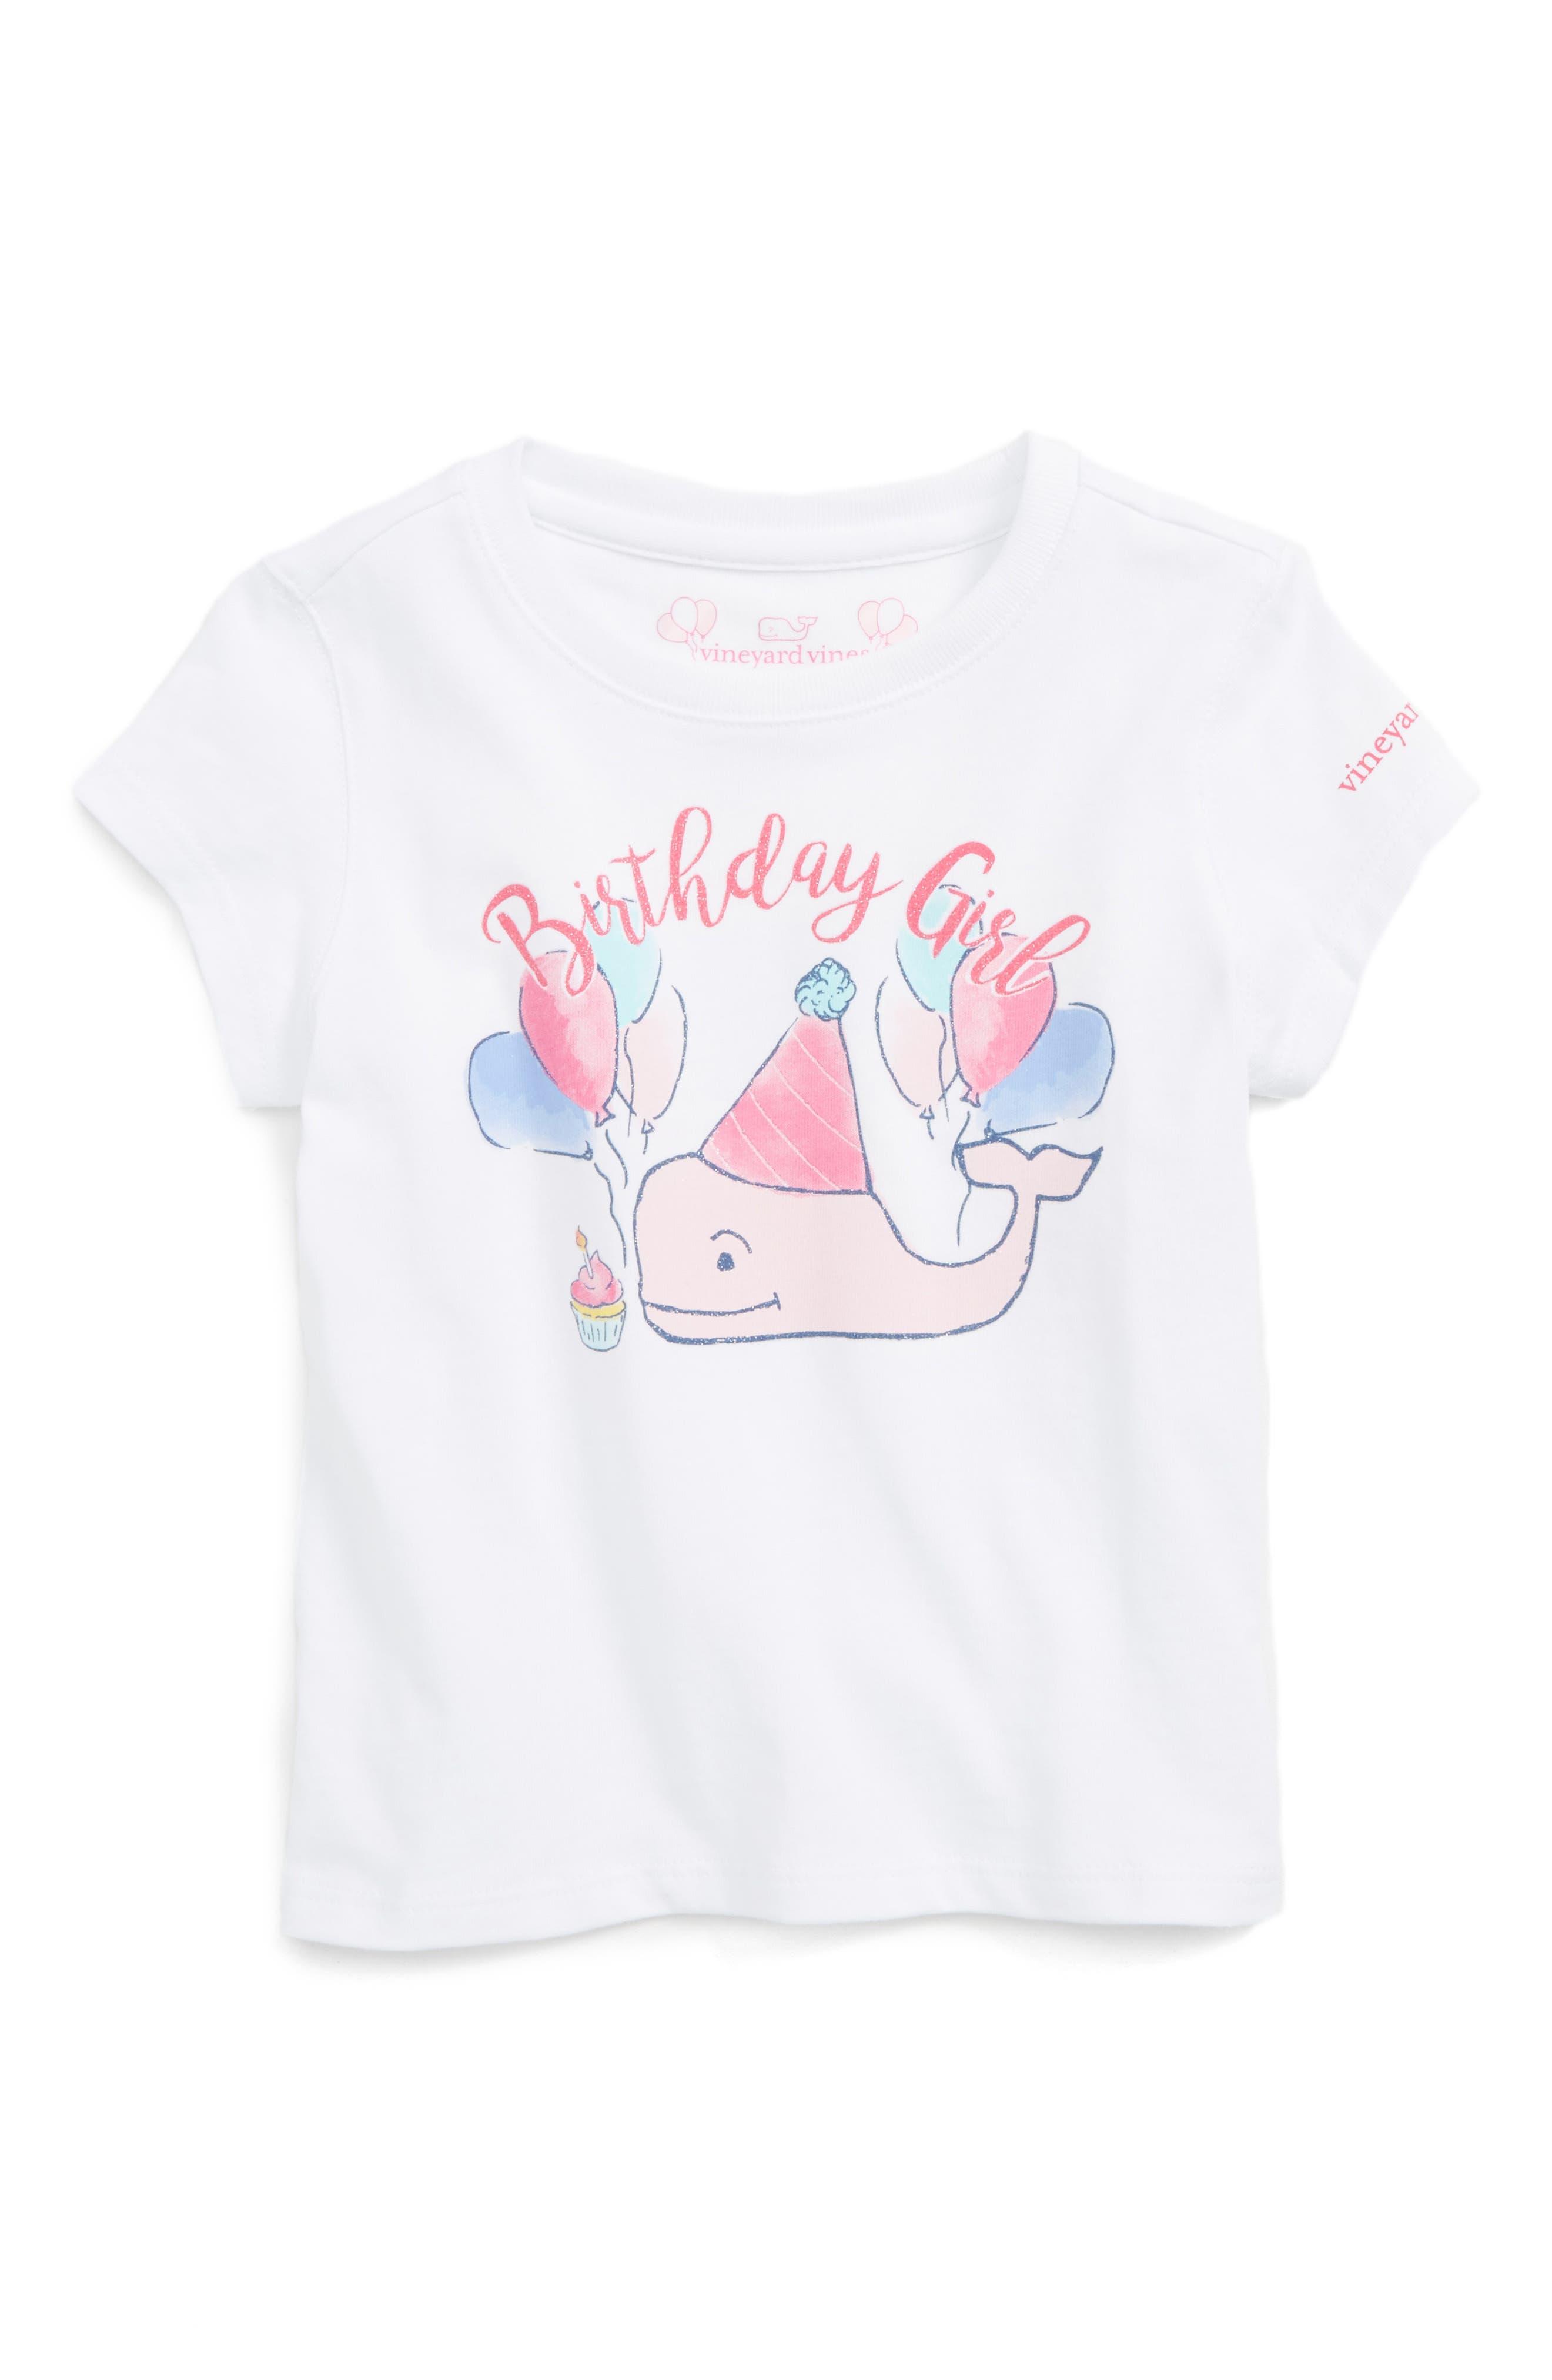 Vineyard Vines Birthday Girl Whale Graphic Tee (Toddler Girls)